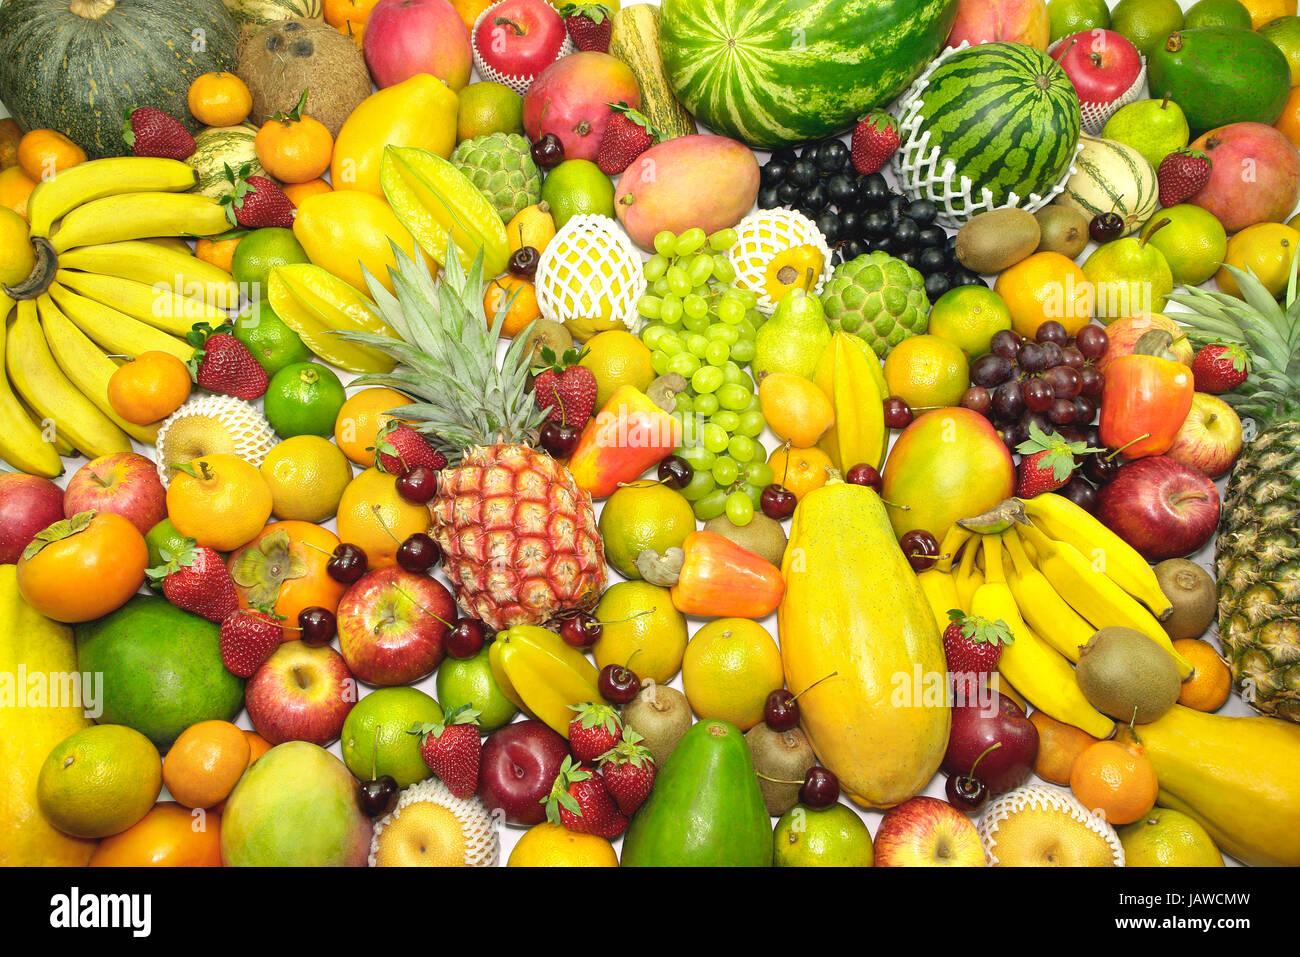 several variety of fruits